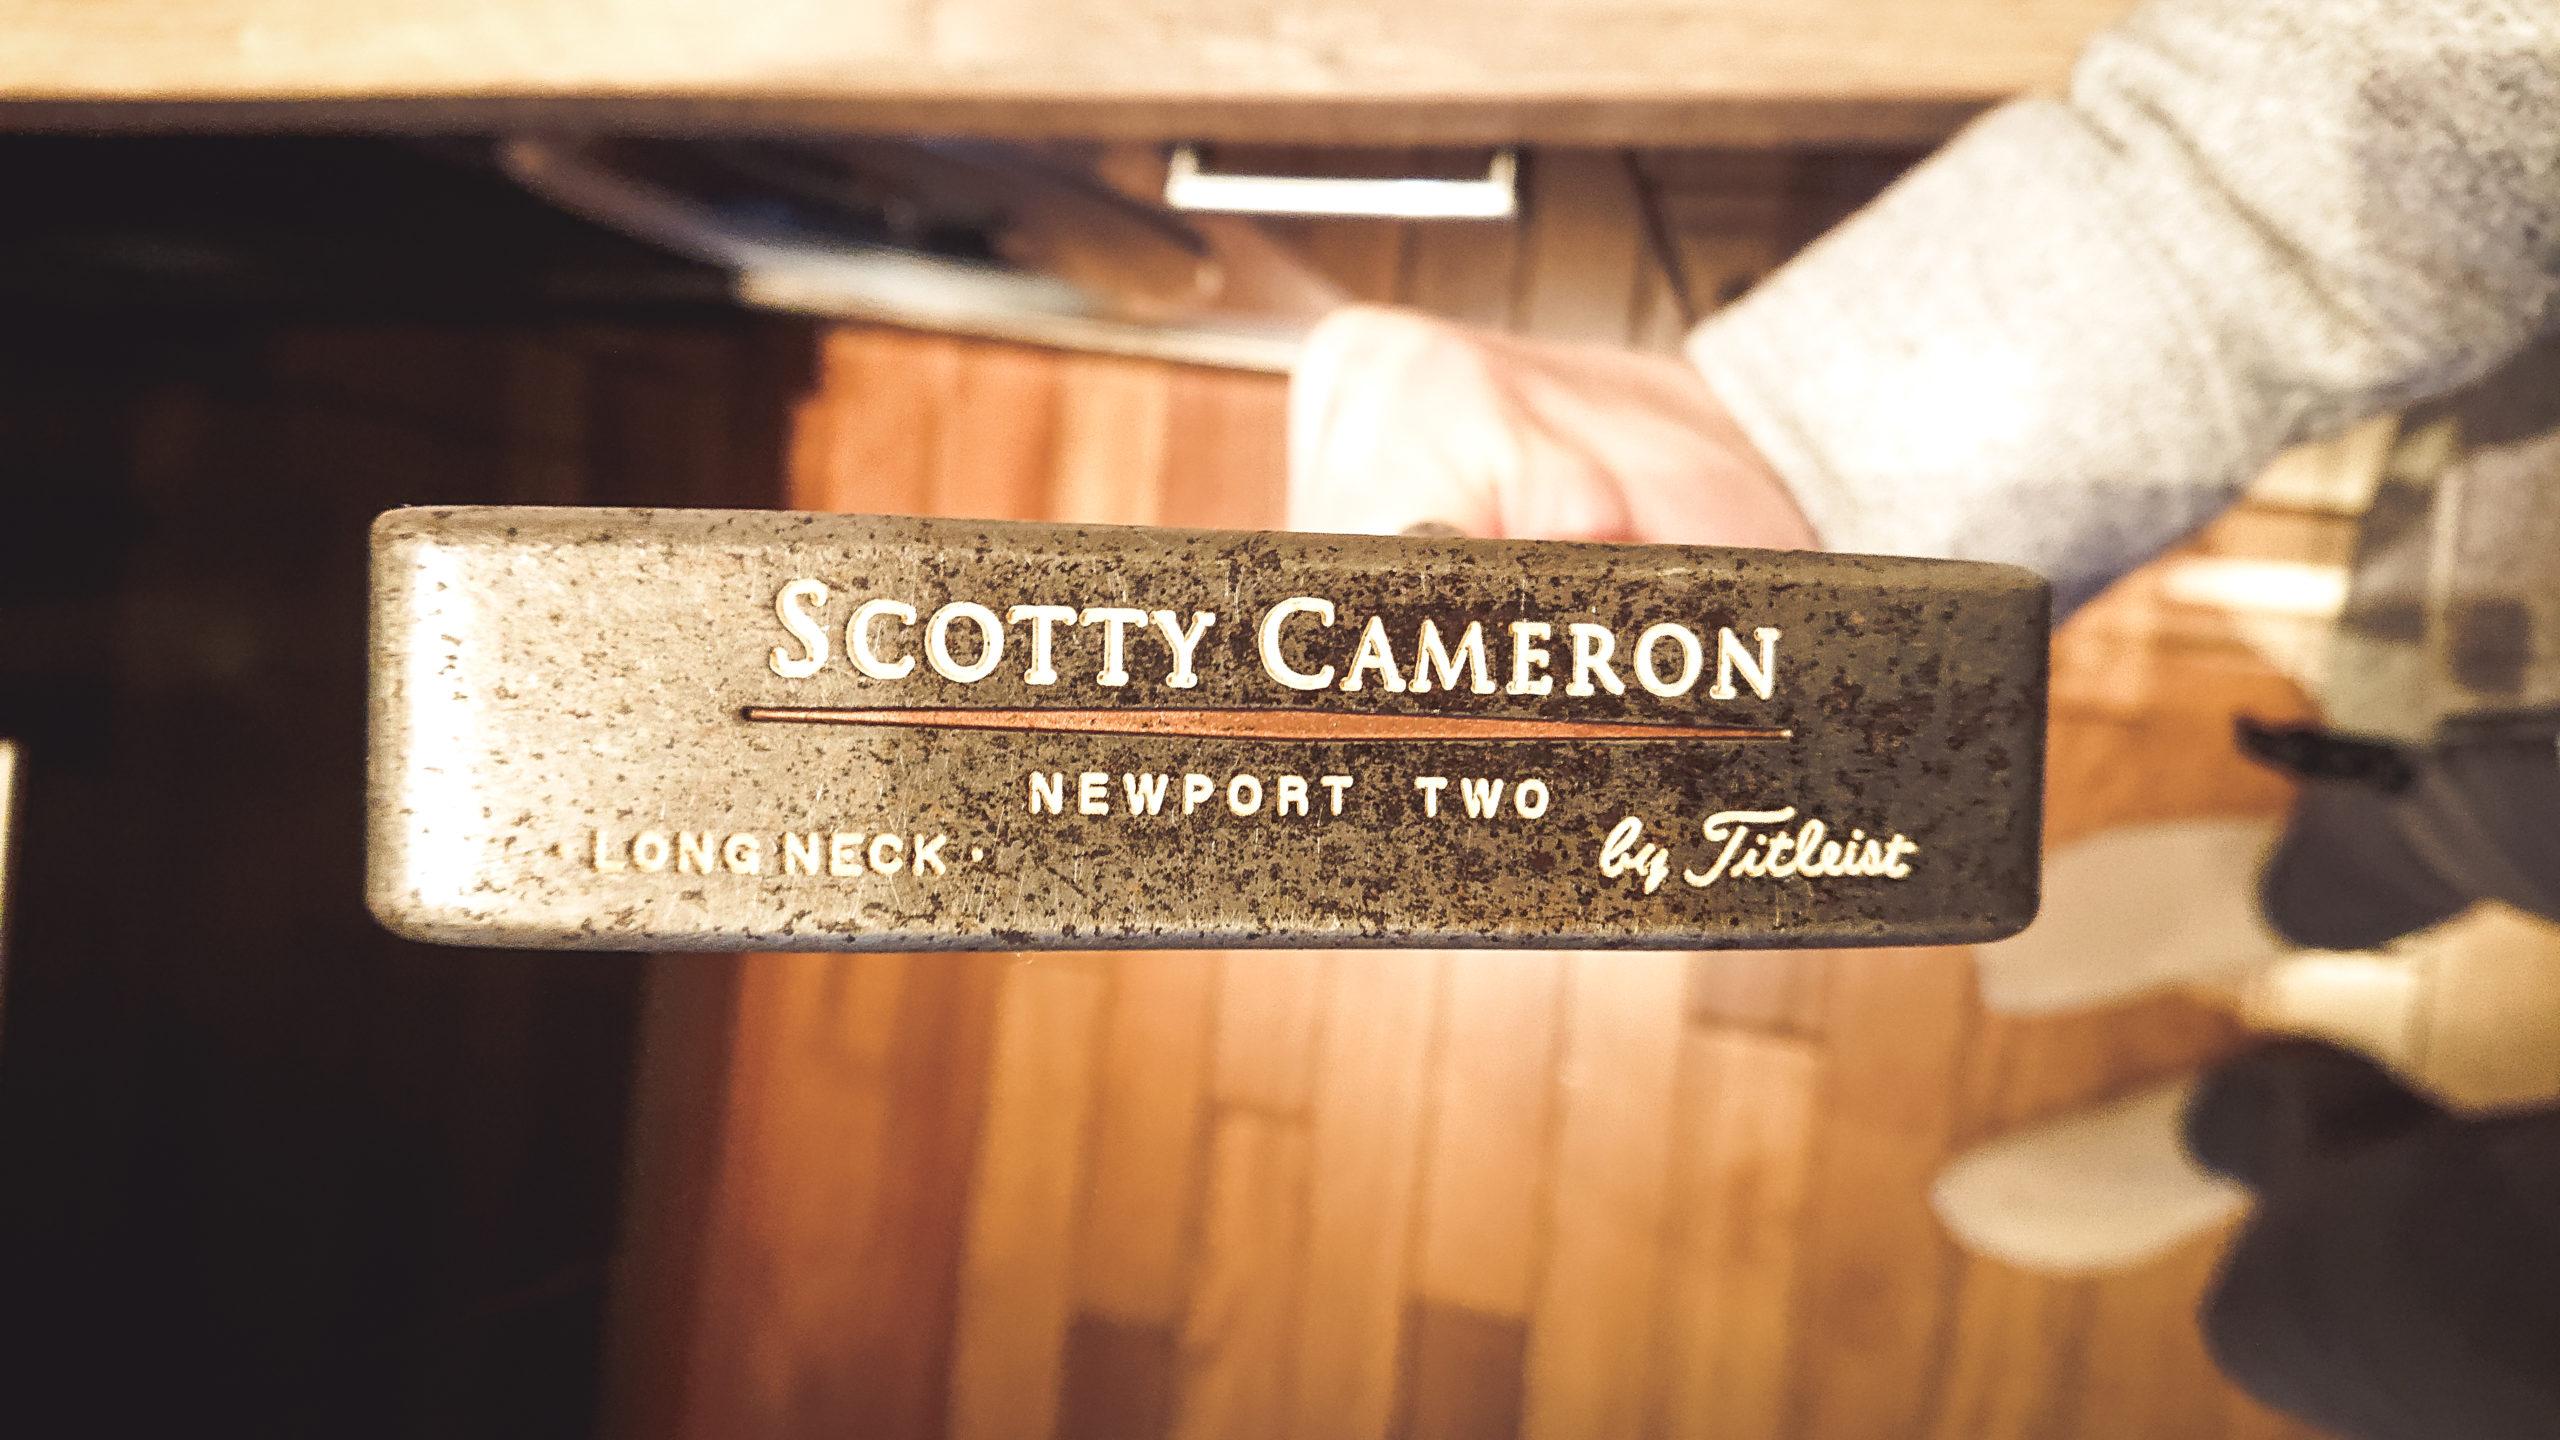 scotty cameron sans peinture